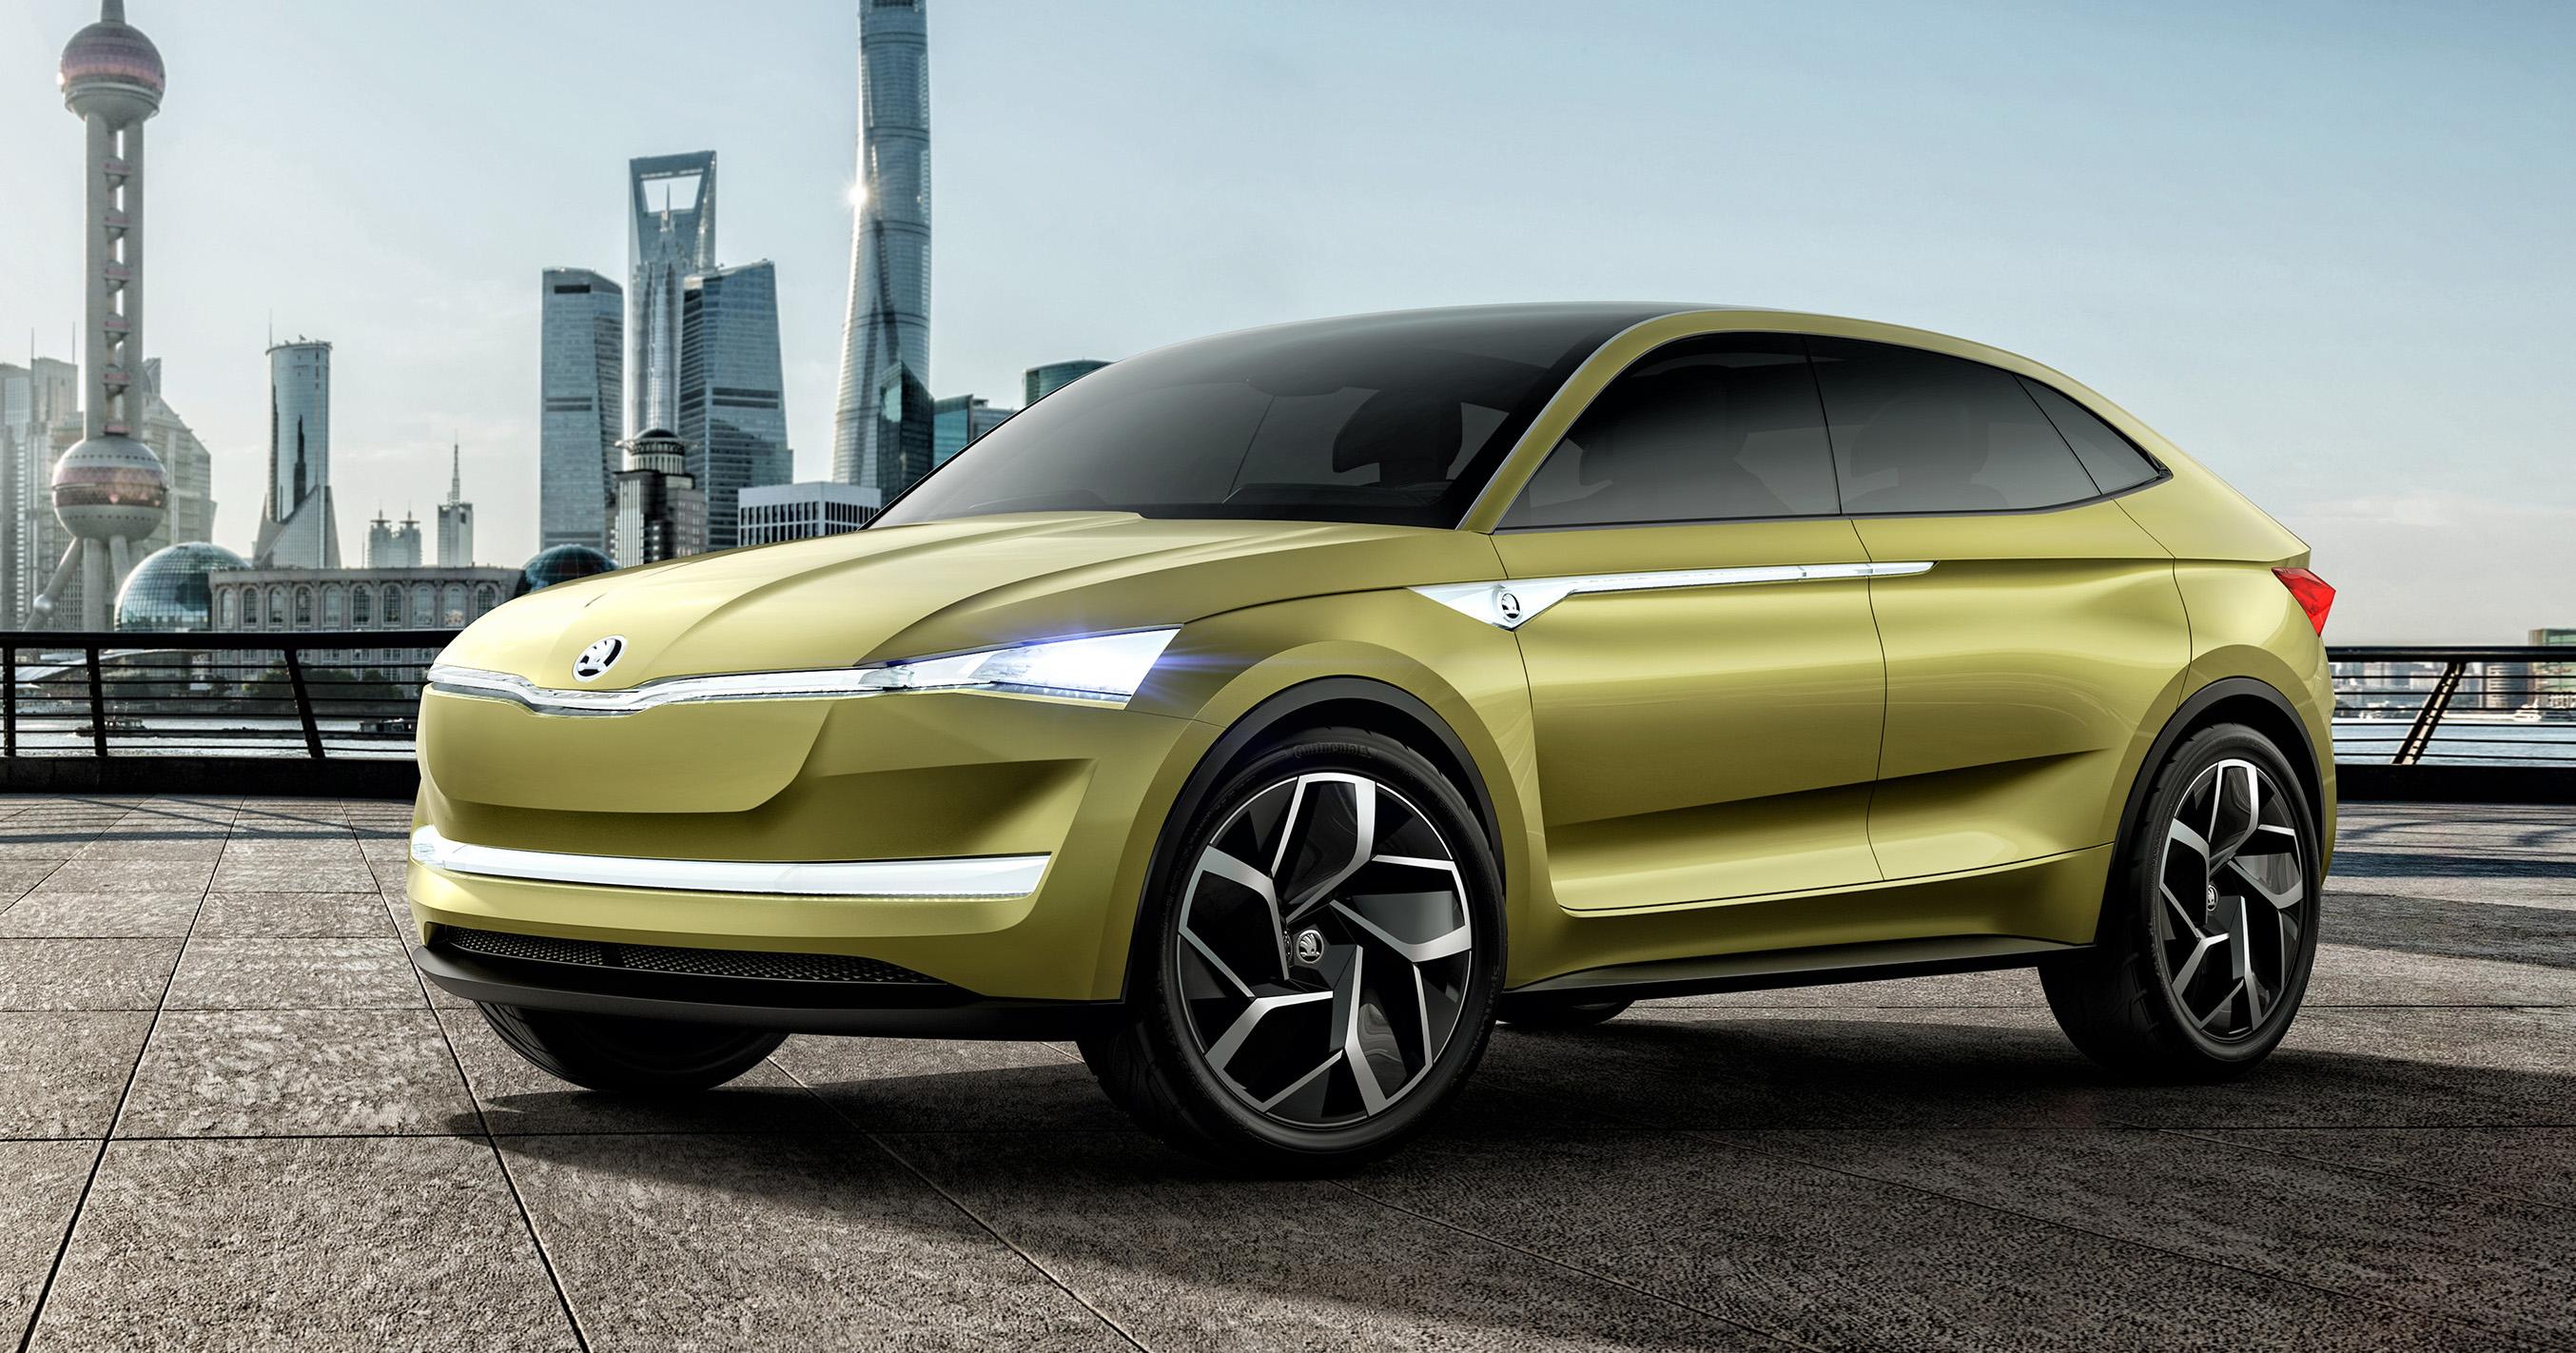 Skoda Vision-E concept revealed - up to 500 km range